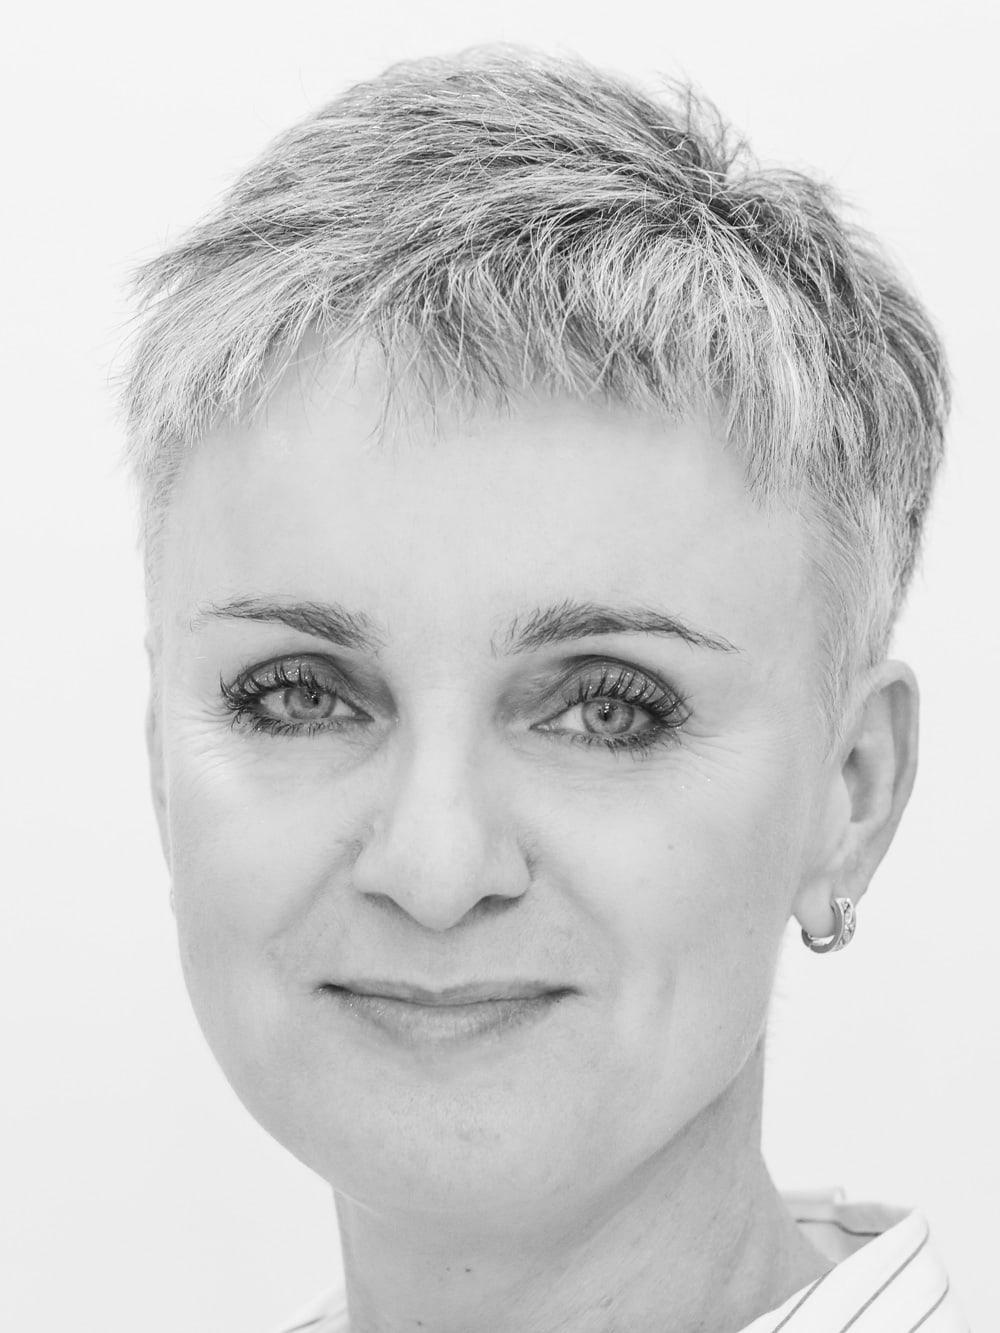 Monika-Ciszewska-Eurodent gabinet stomatologiczny Bielawa